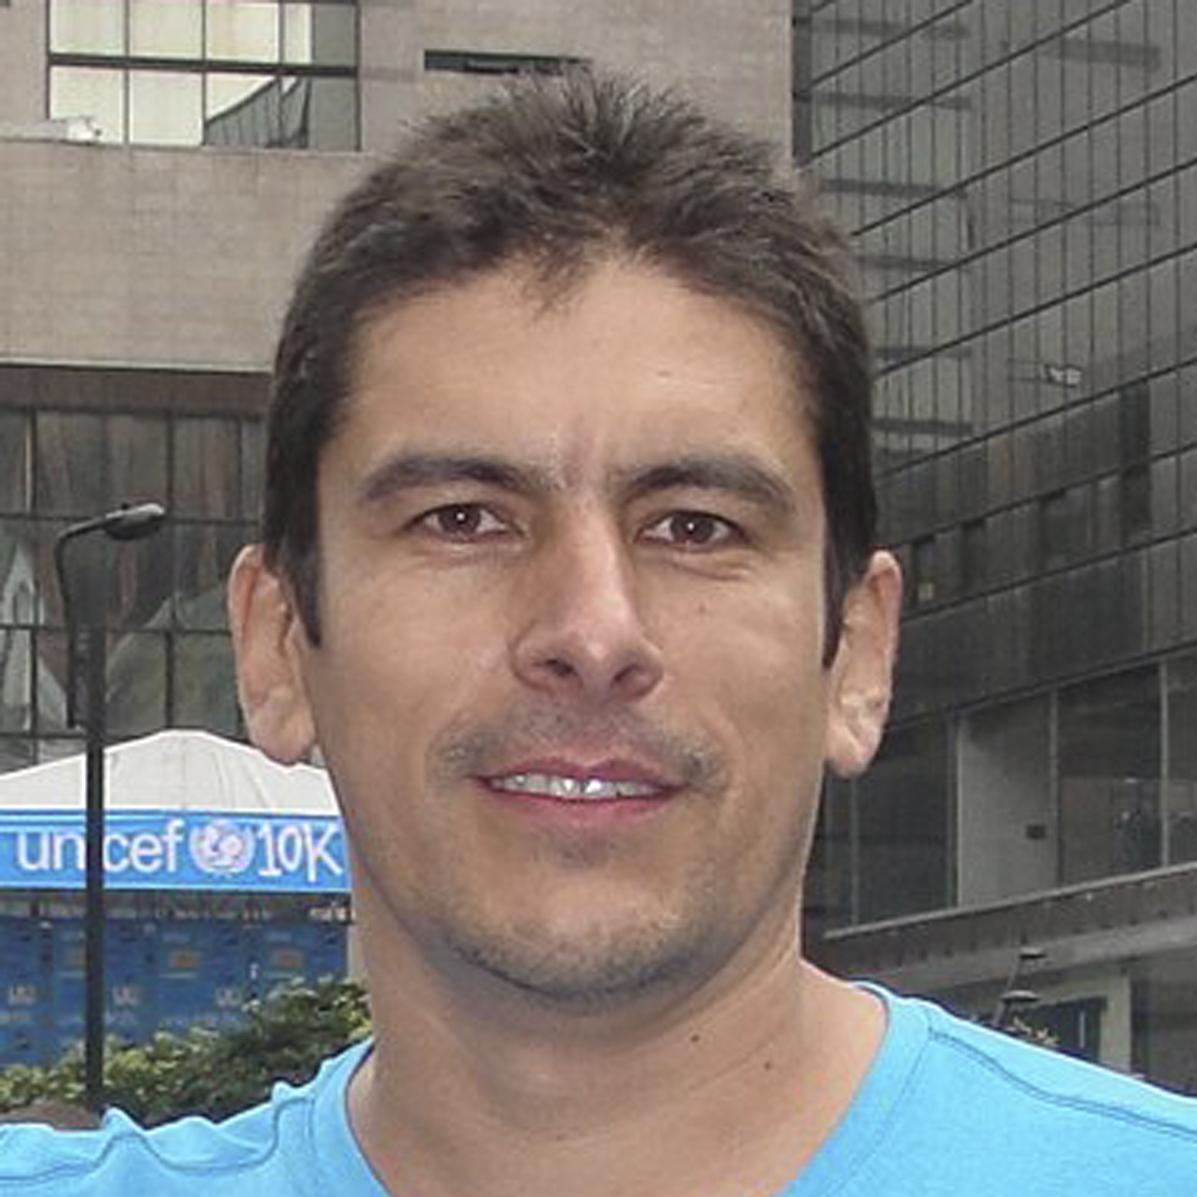 Mauricio Palacios Gómez